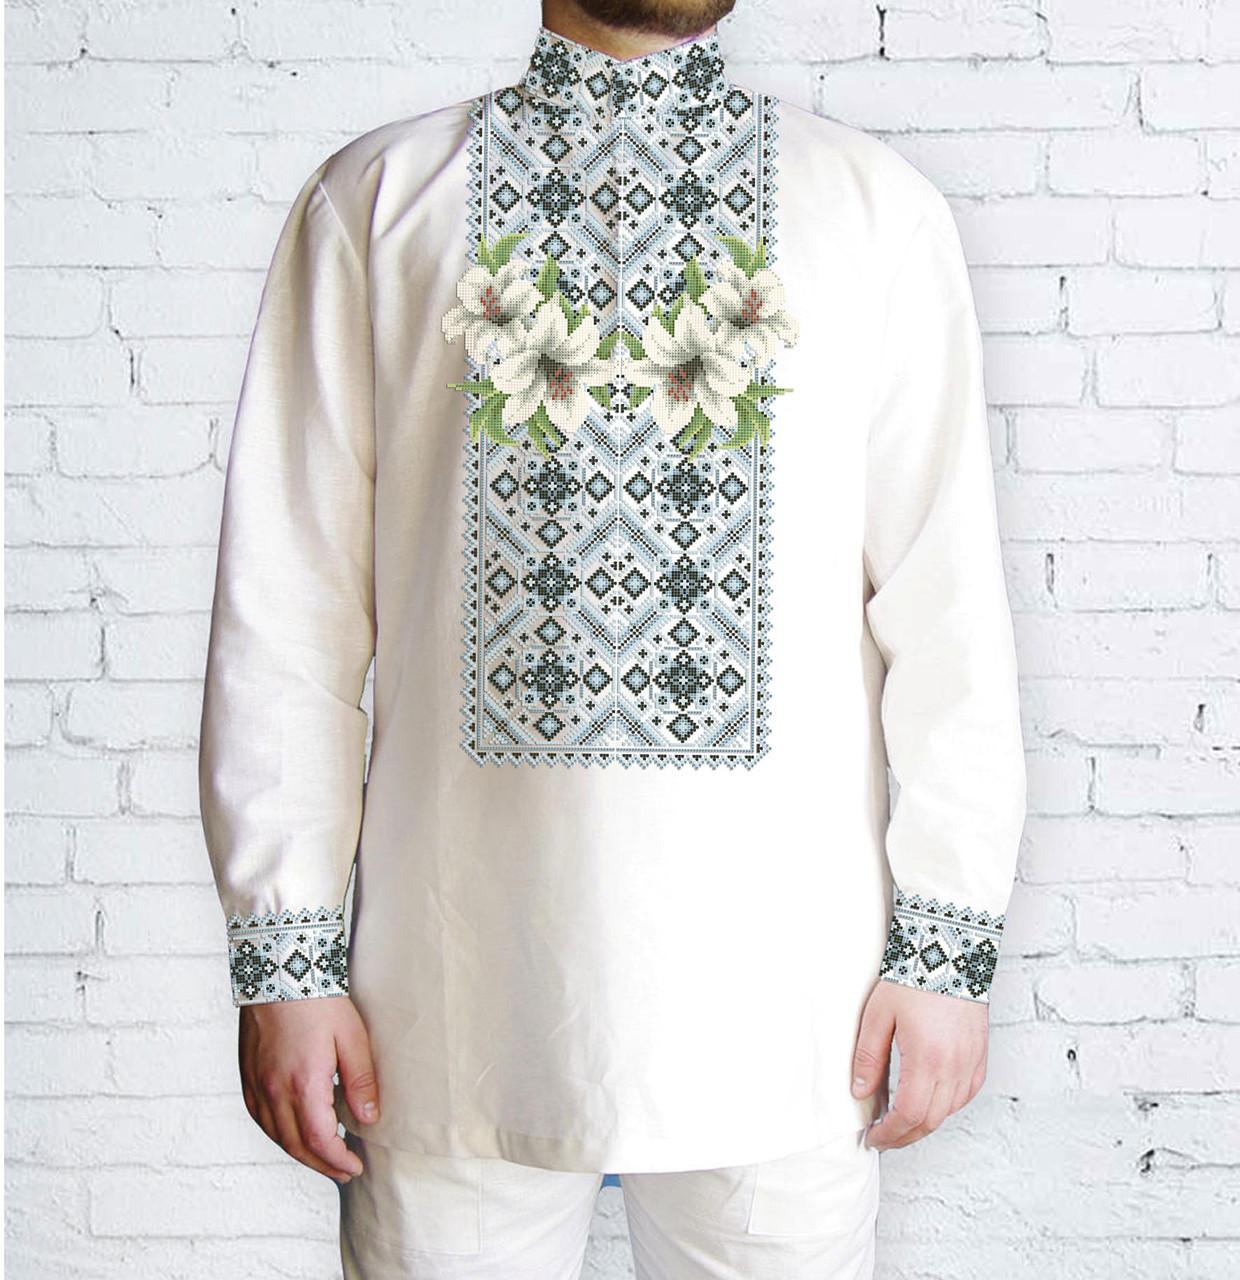 Заготовка мужской рубашки / вышиванки / сорочки для вышивки / вышивания бисером или нитками «Ніжні лілії 48 л»